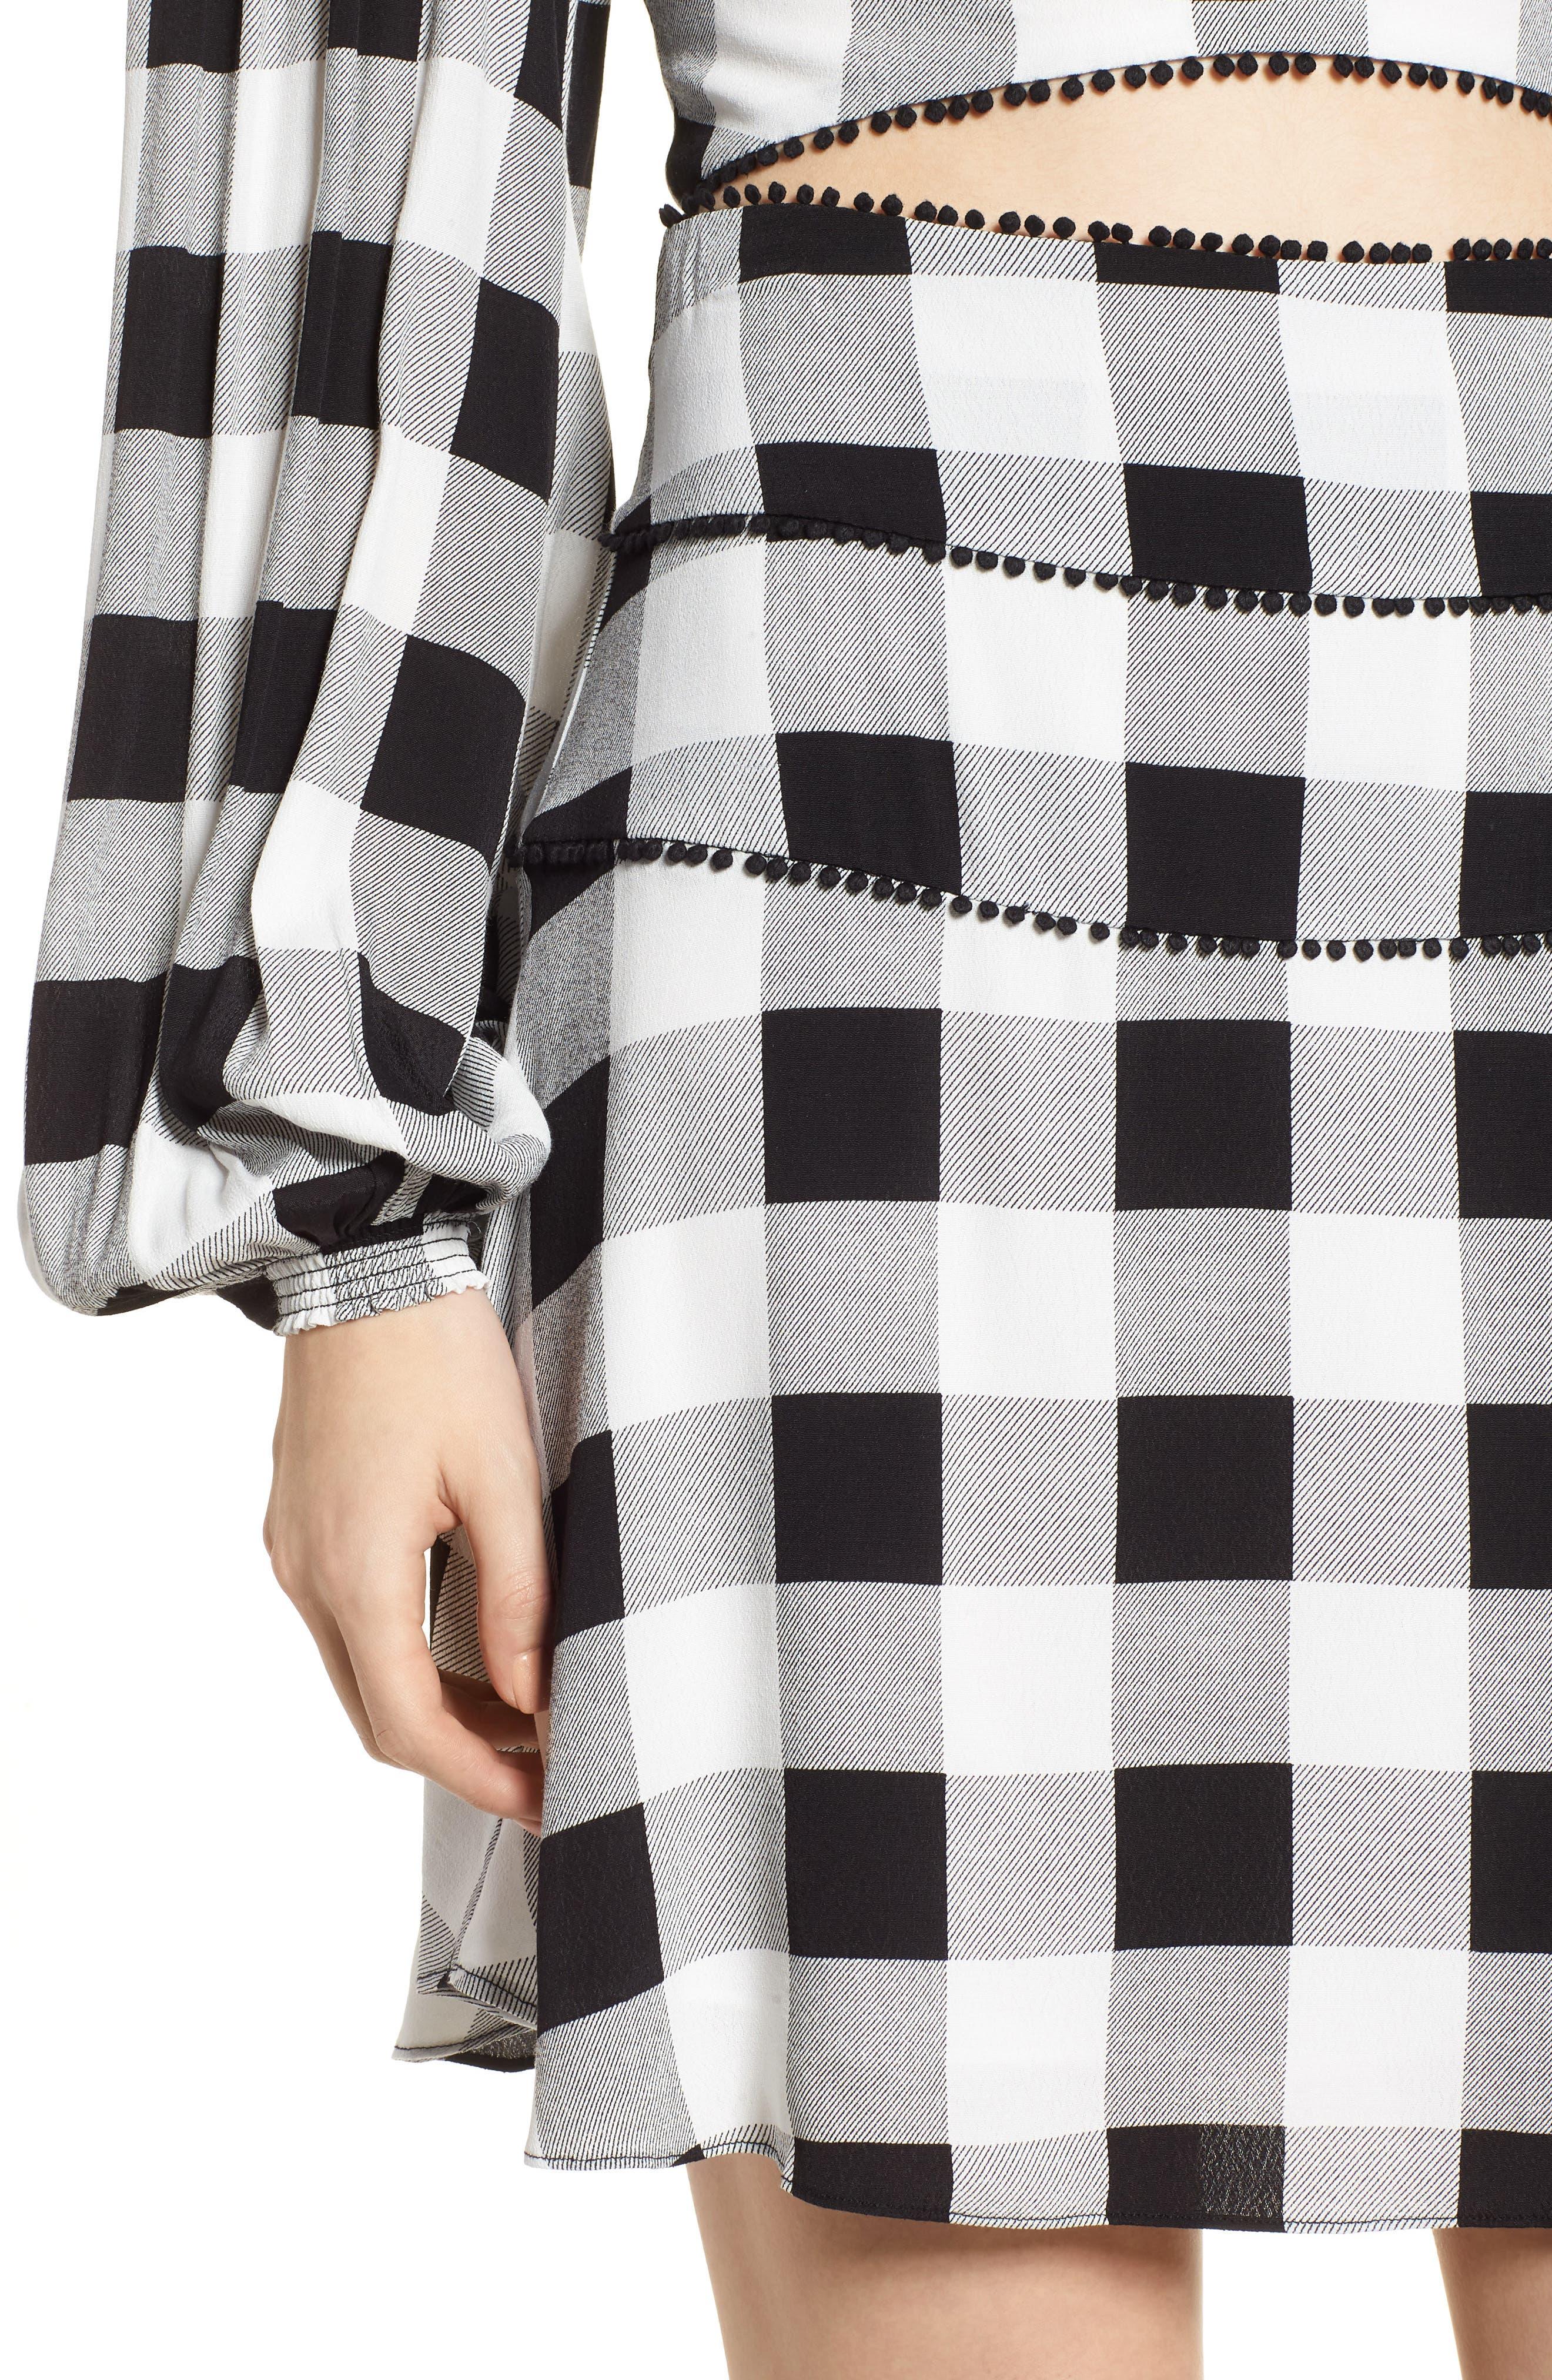 Bell High Waist Miniskirt,                             Alternate thumbnail 4, color,                             002